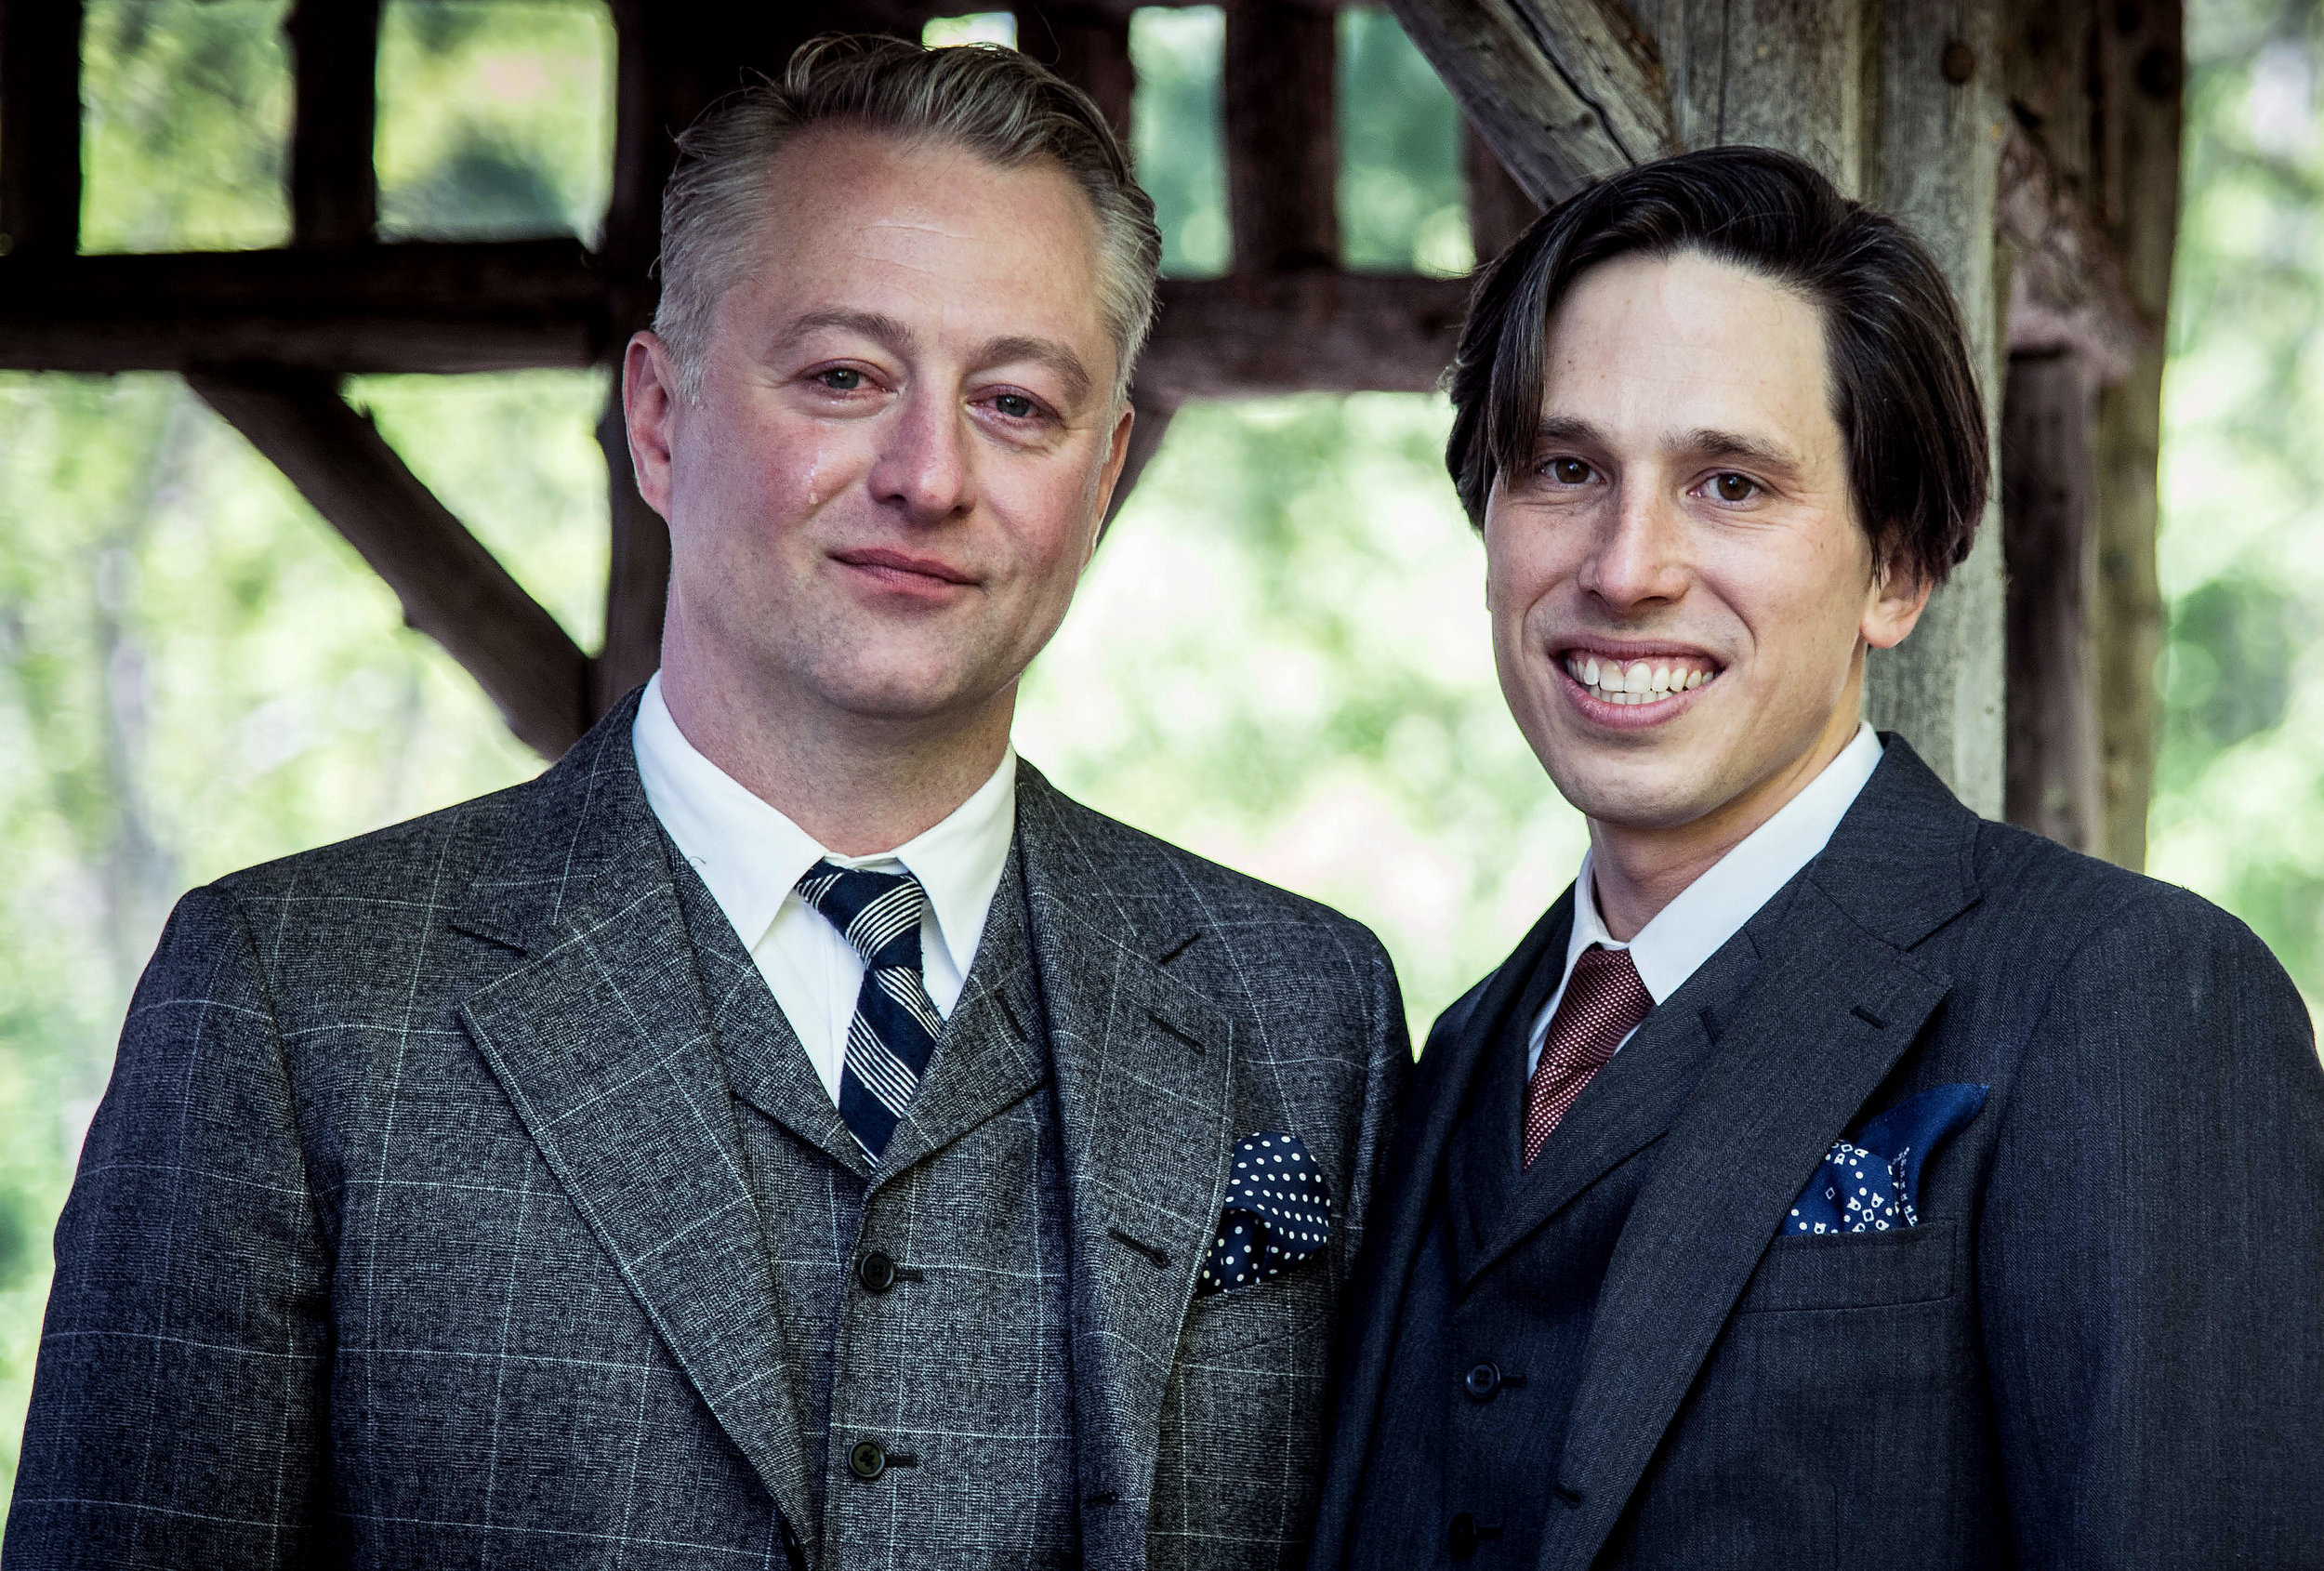 Gay_Wedding.jpg